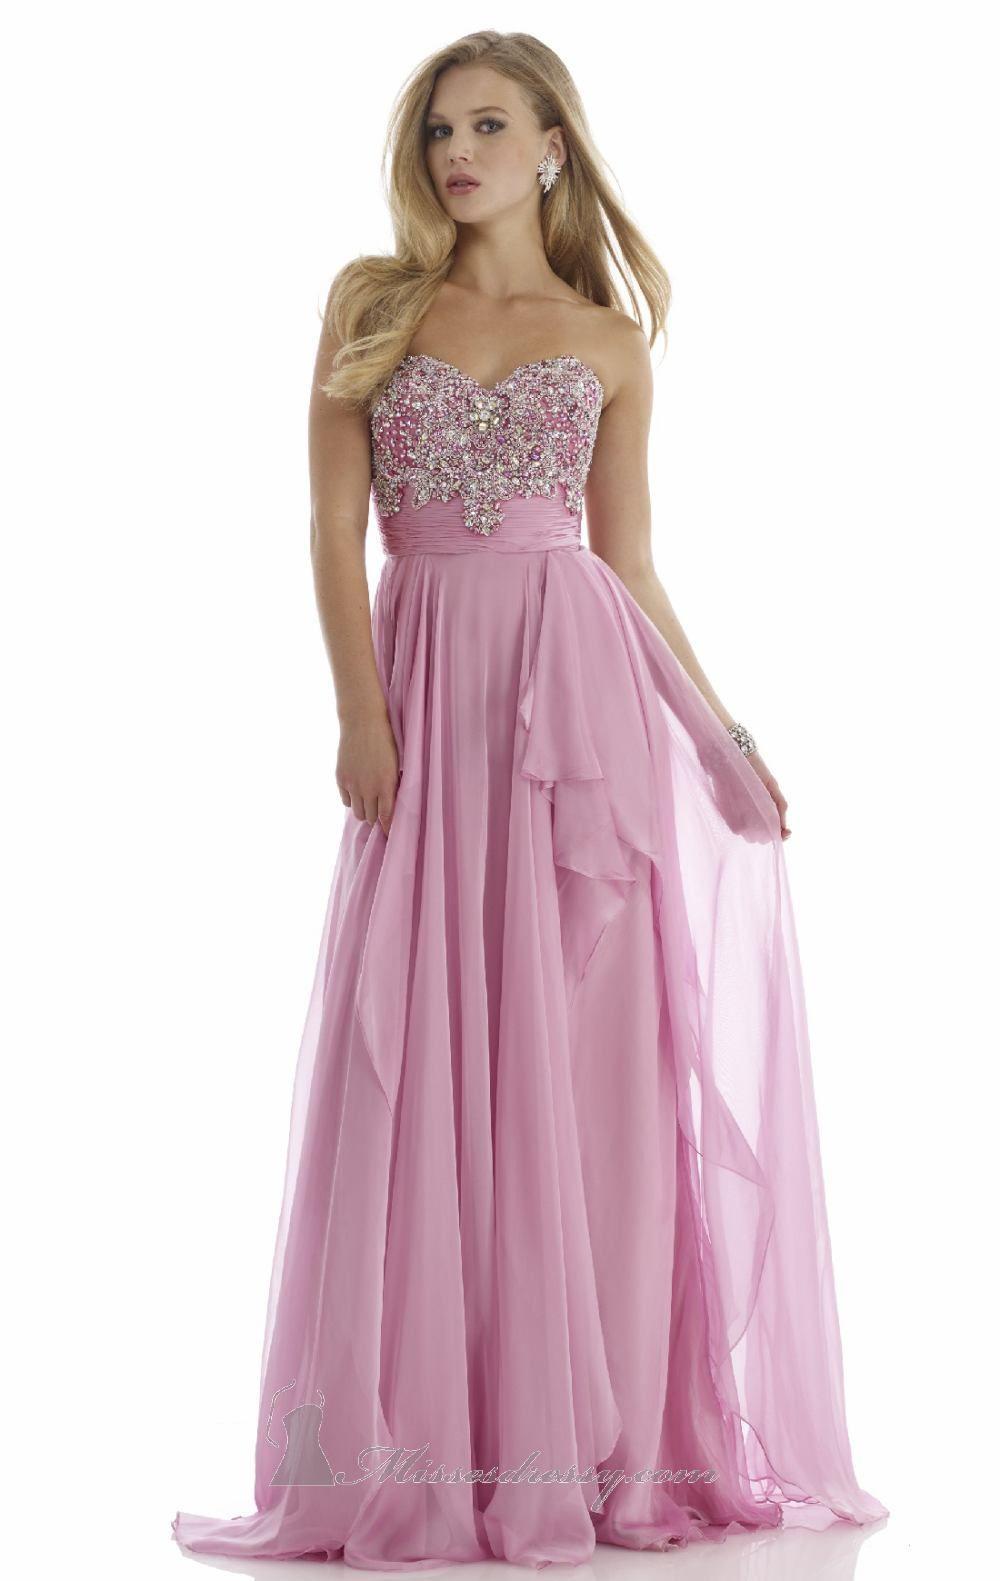 Morrell Maxie 14088 Dress - MissesDressy.com Get it here: http://www ...